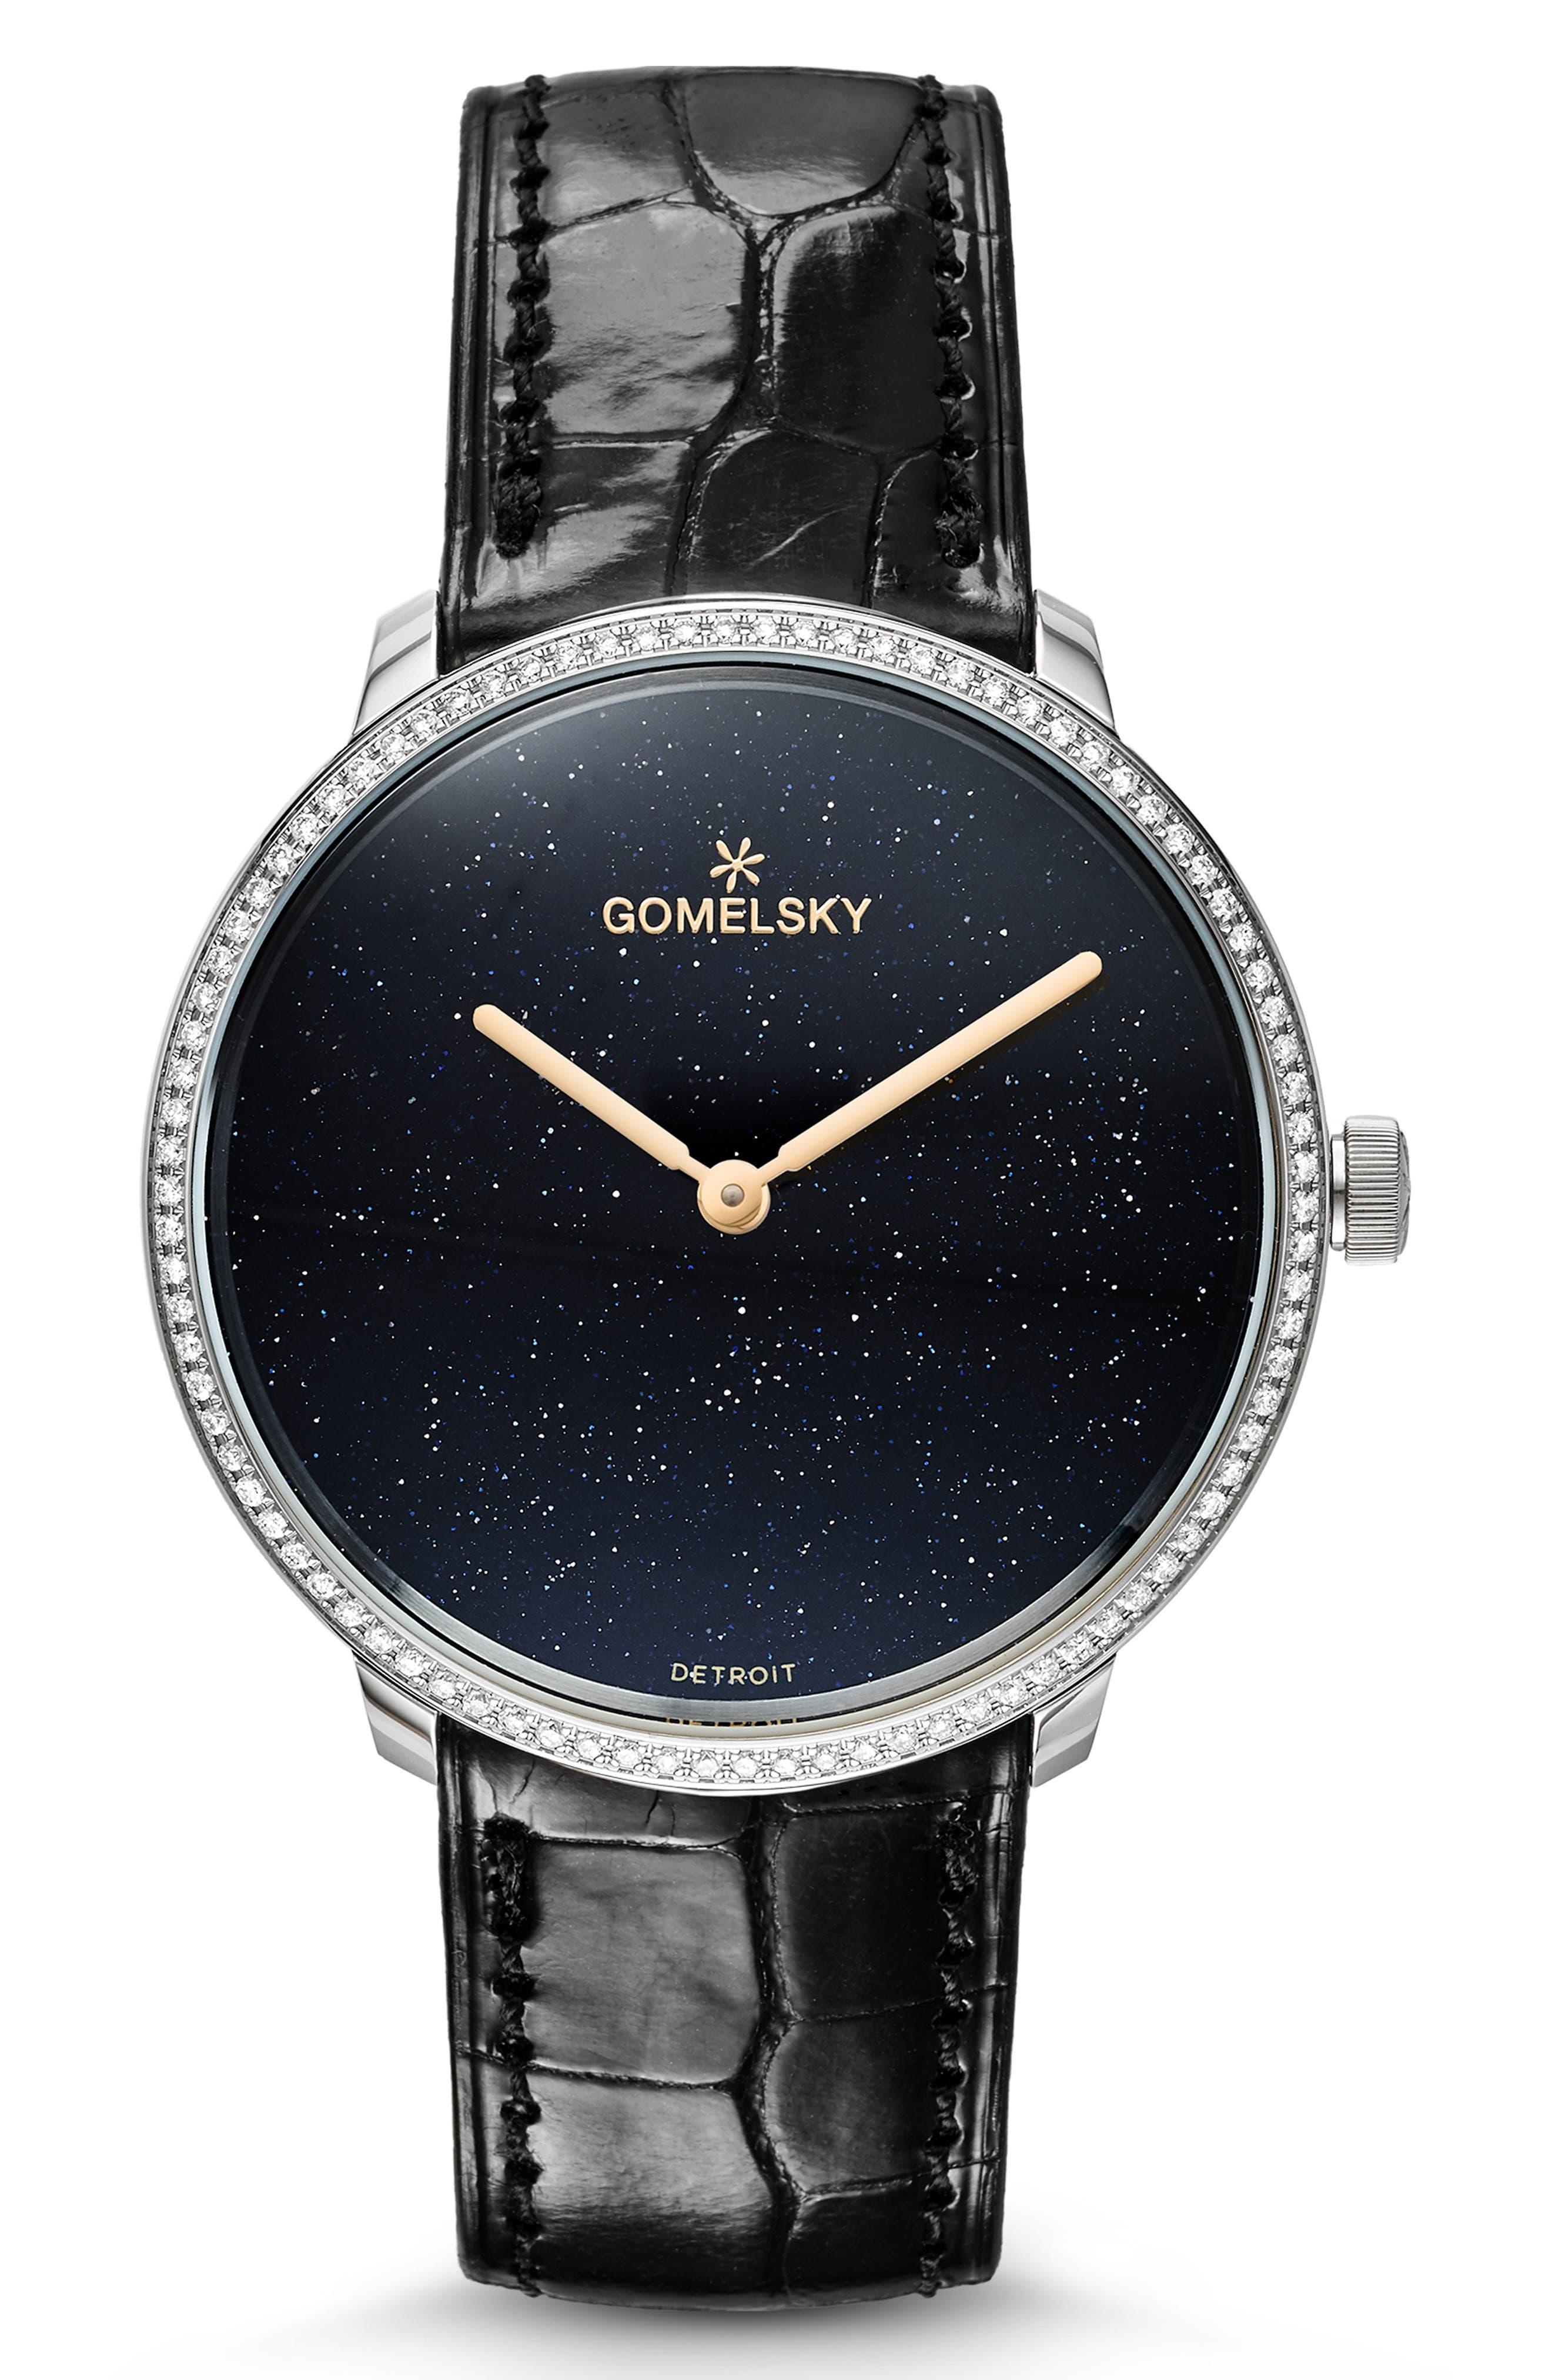 GOMELSKY The Lois Diamond Alligator Strap Watch, 36Mm in Black/ Sandstone/ Silver